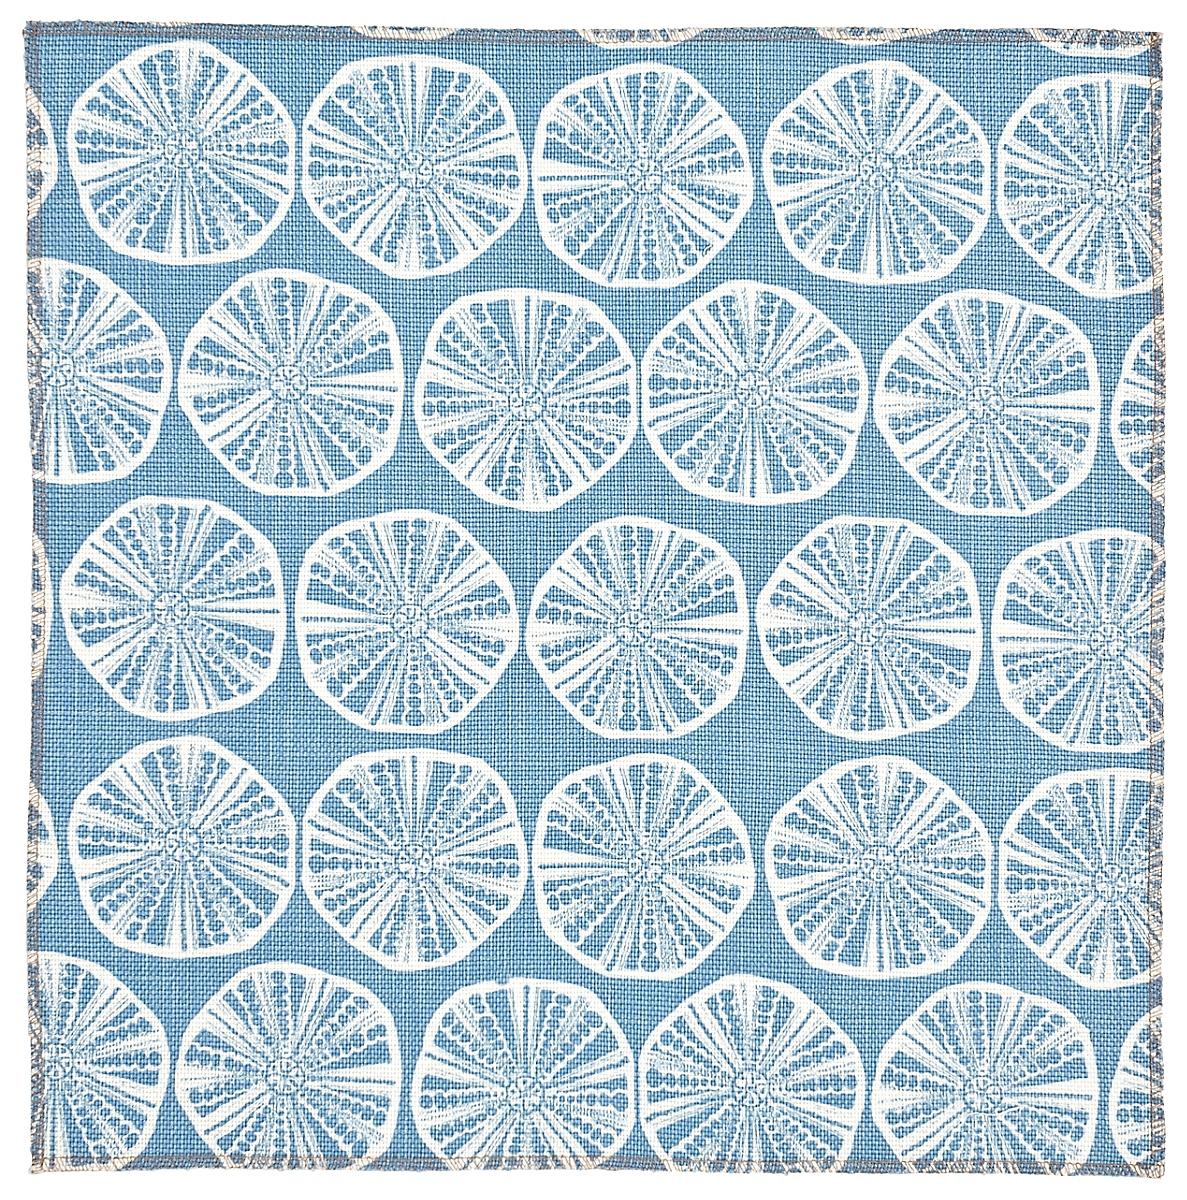 Sea Biscuit: True Blue (fabric yardage)